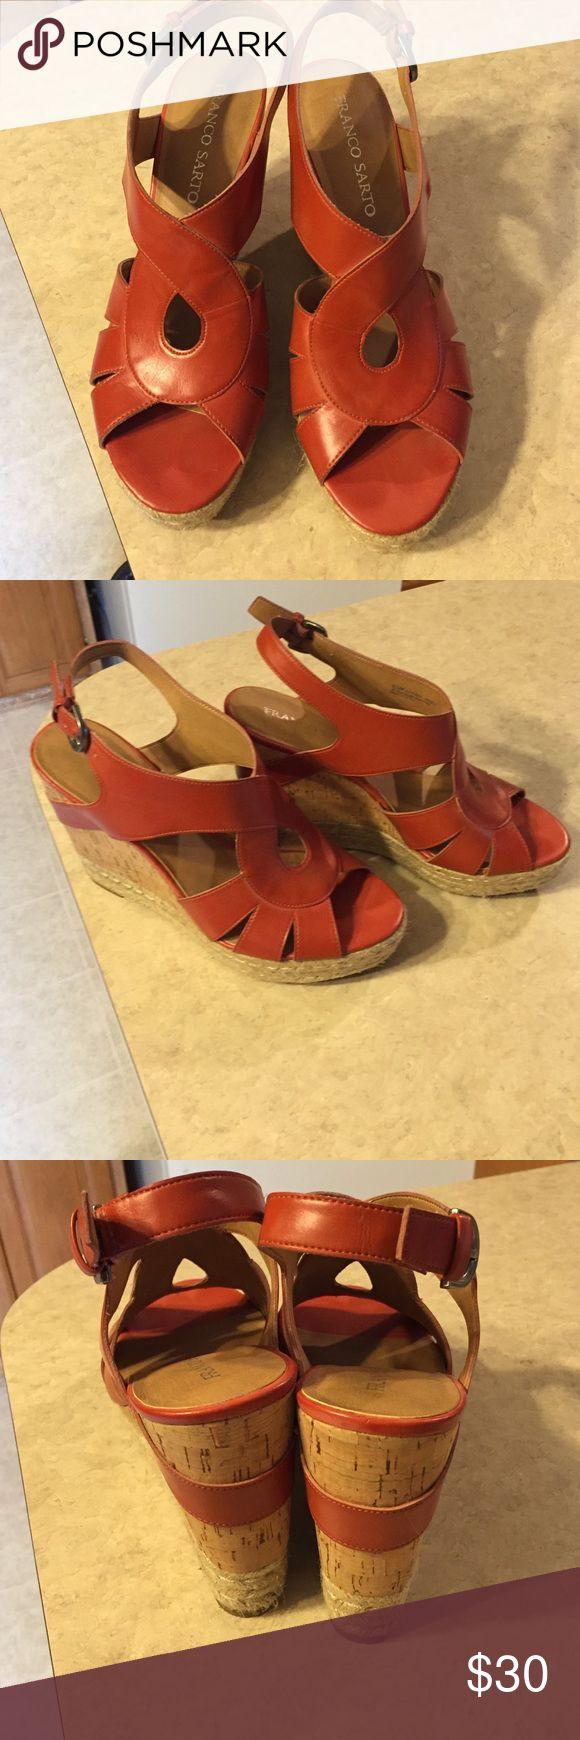 ❗️Sale ❗️Franco Sarto sandals 👠on sale🎉 Franco Sarto Daffodi Sandals in Coral.Worn only a few times. Franco Sarto Shoes Sandals